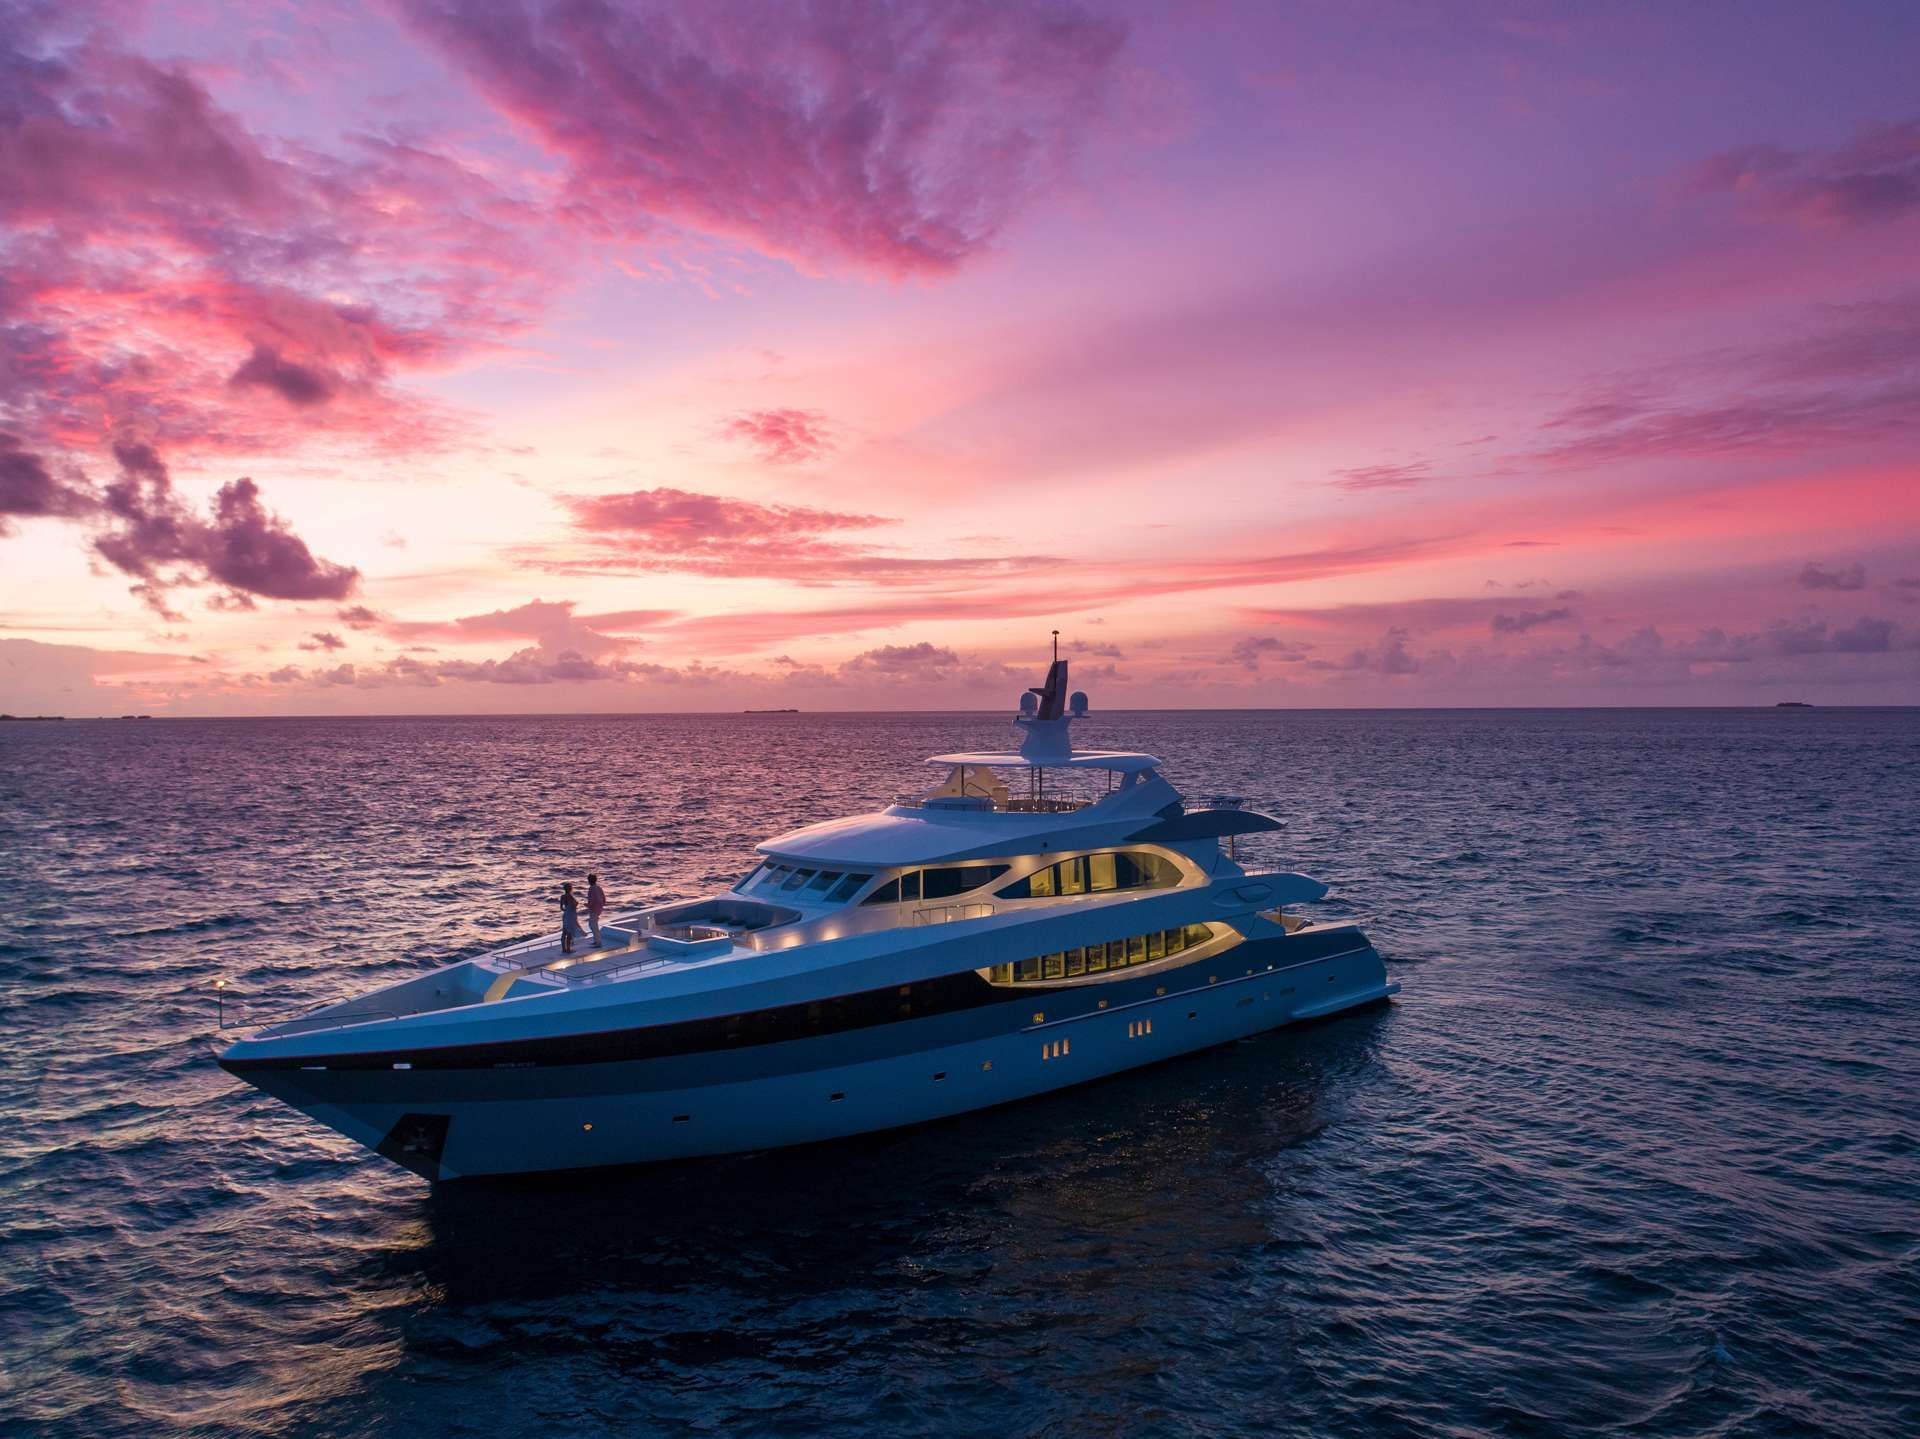 SEAREX - 8 Cabins - Maldives, Indian Ocean